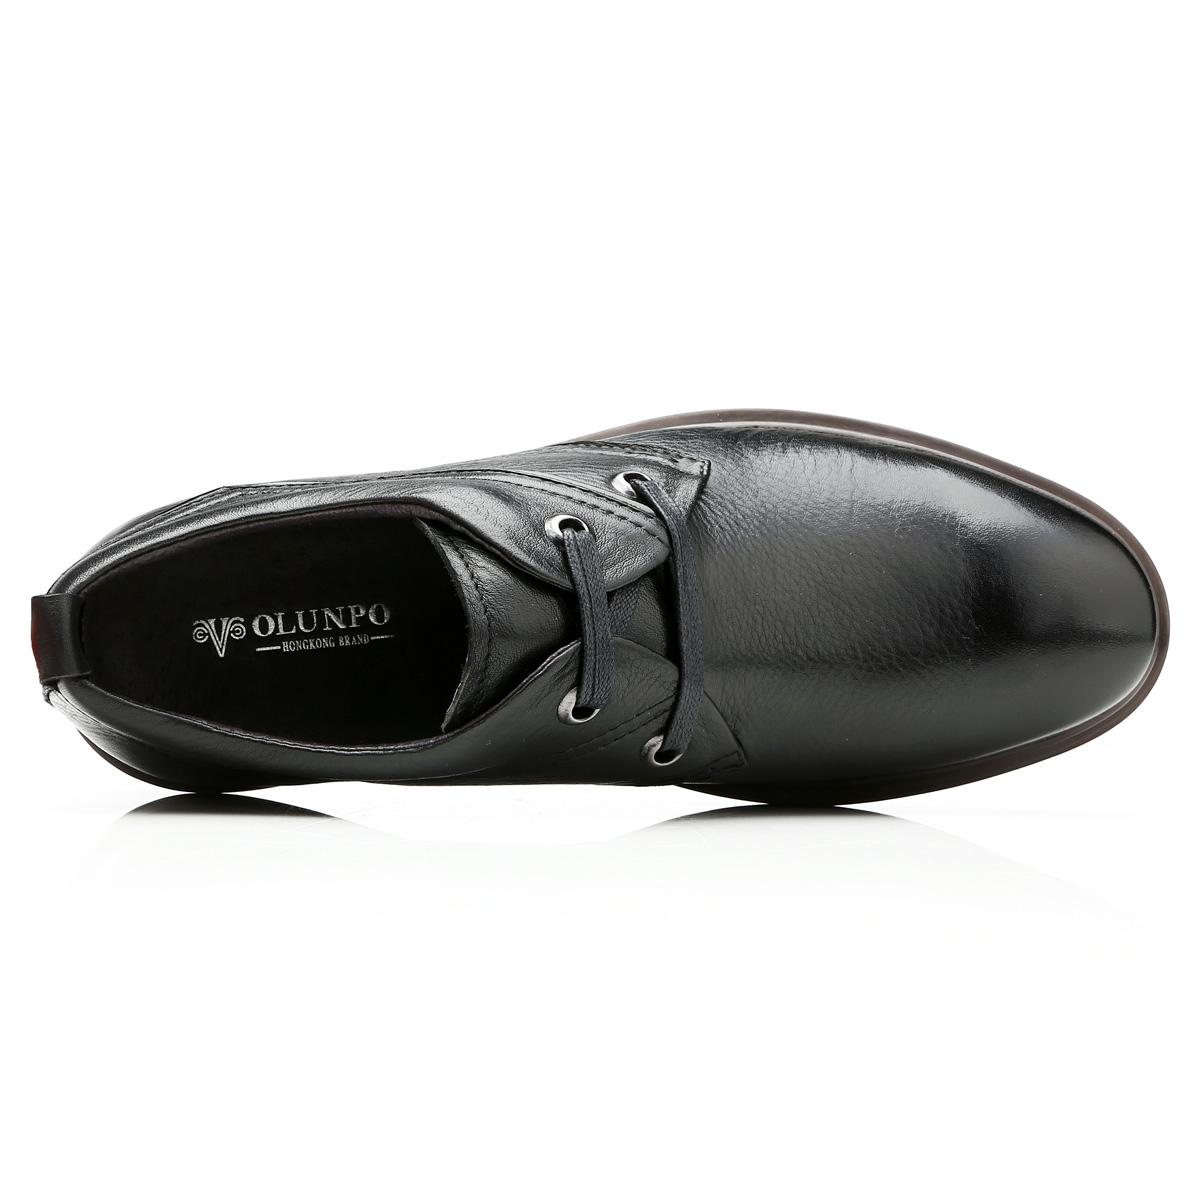 Giày da nam Olunpo QZK1404 hiện đại